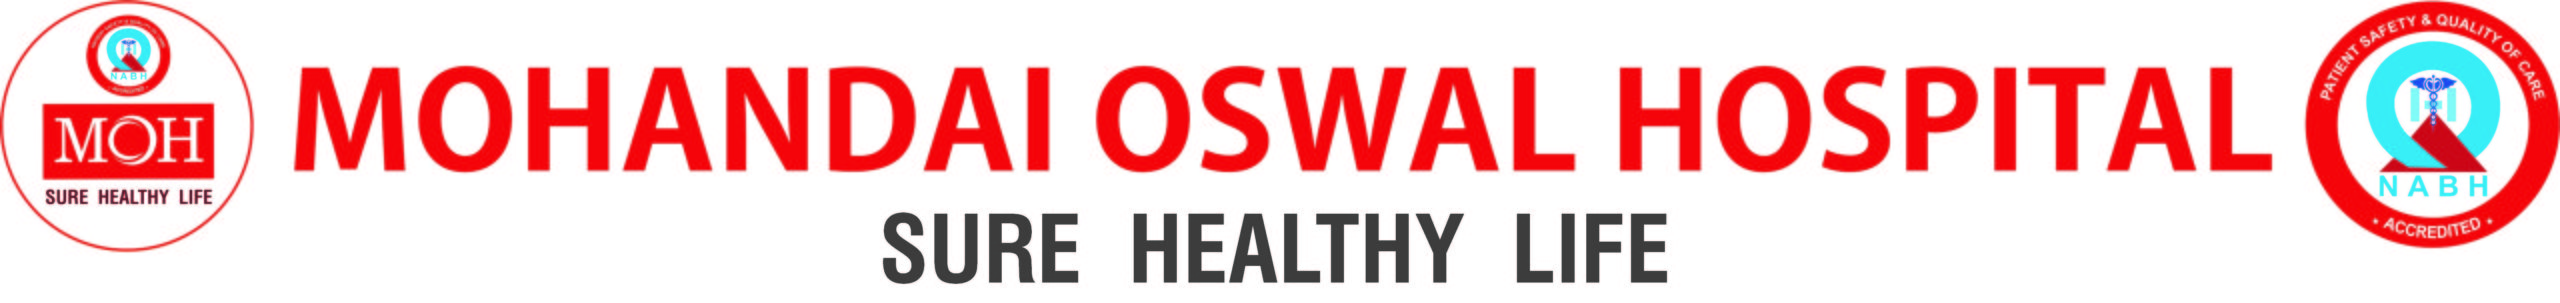 Mohandai Oswal Hospital